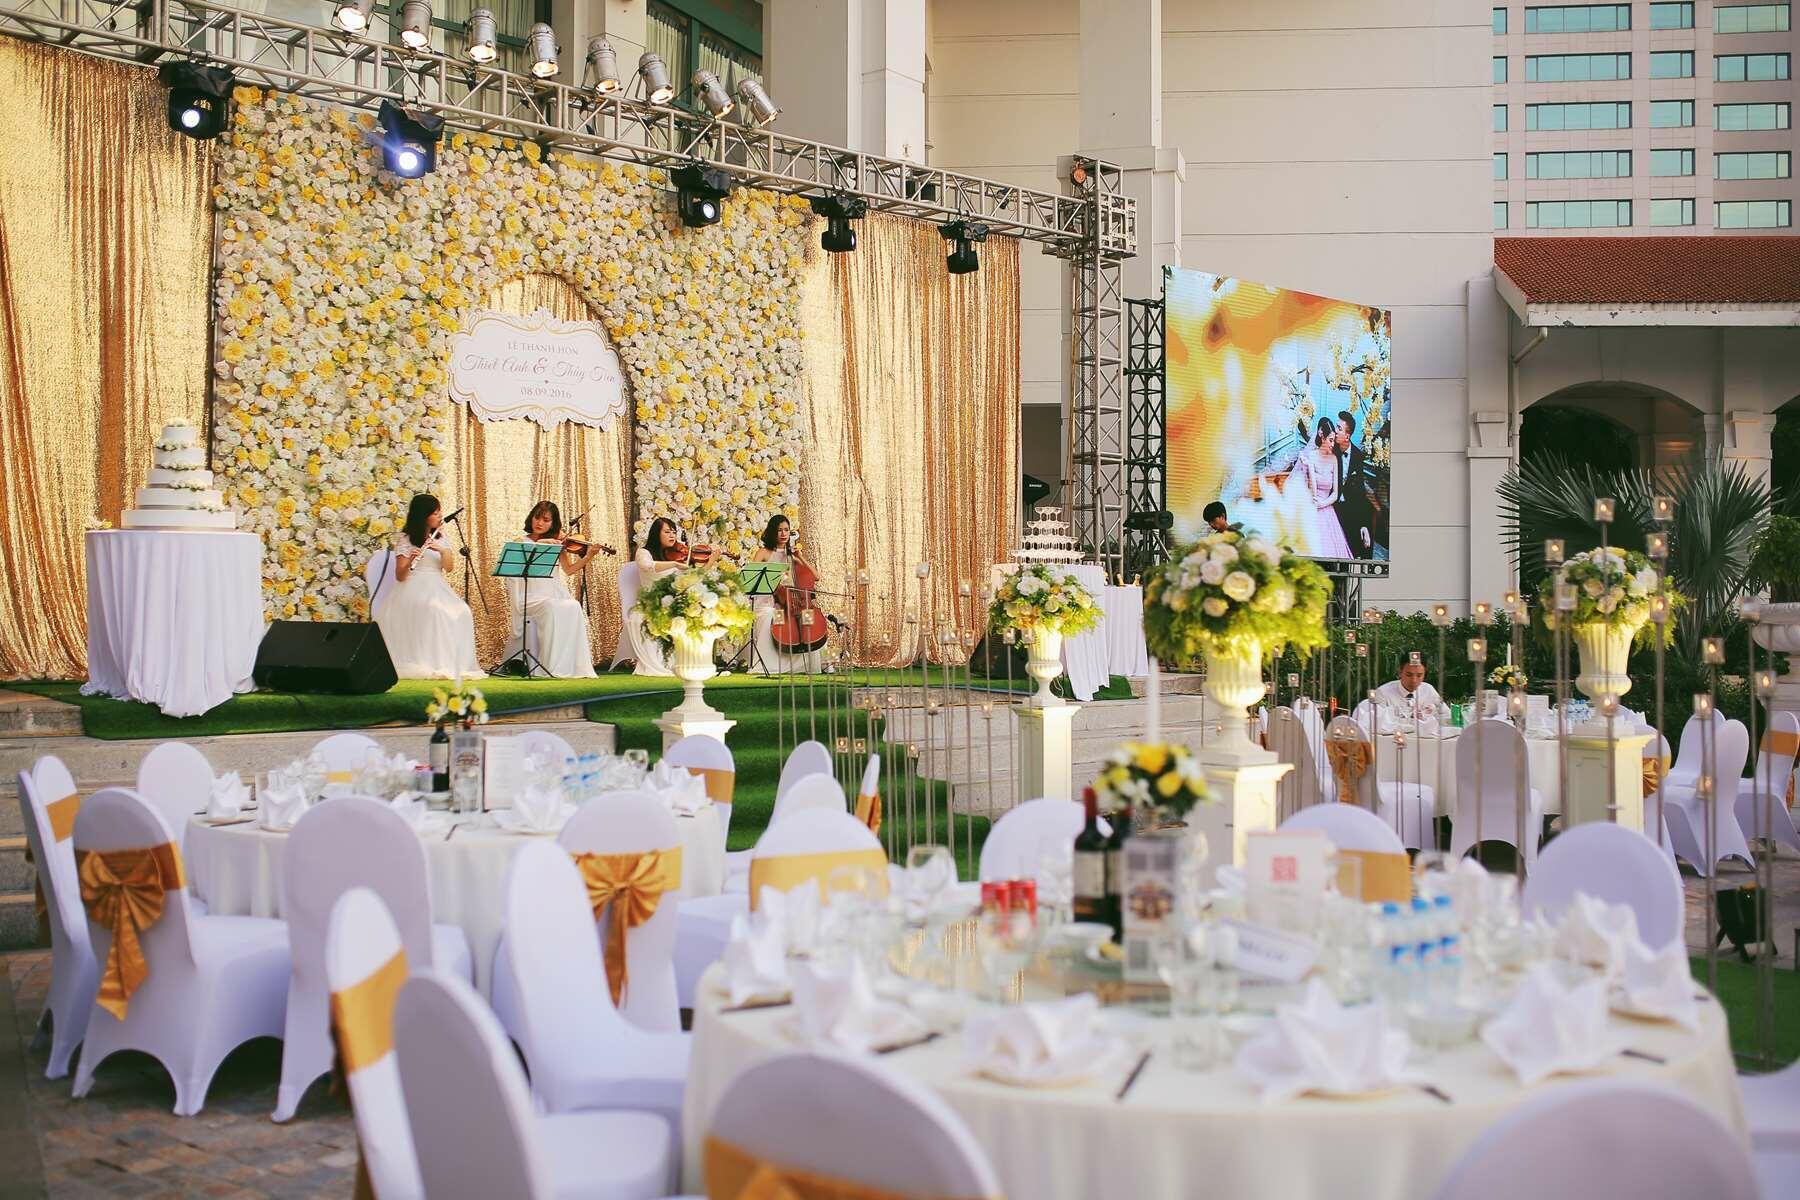 Wedding Venues Hanoi   Wedding Hotels Hanoi   Hanoi Daewoo Hotel